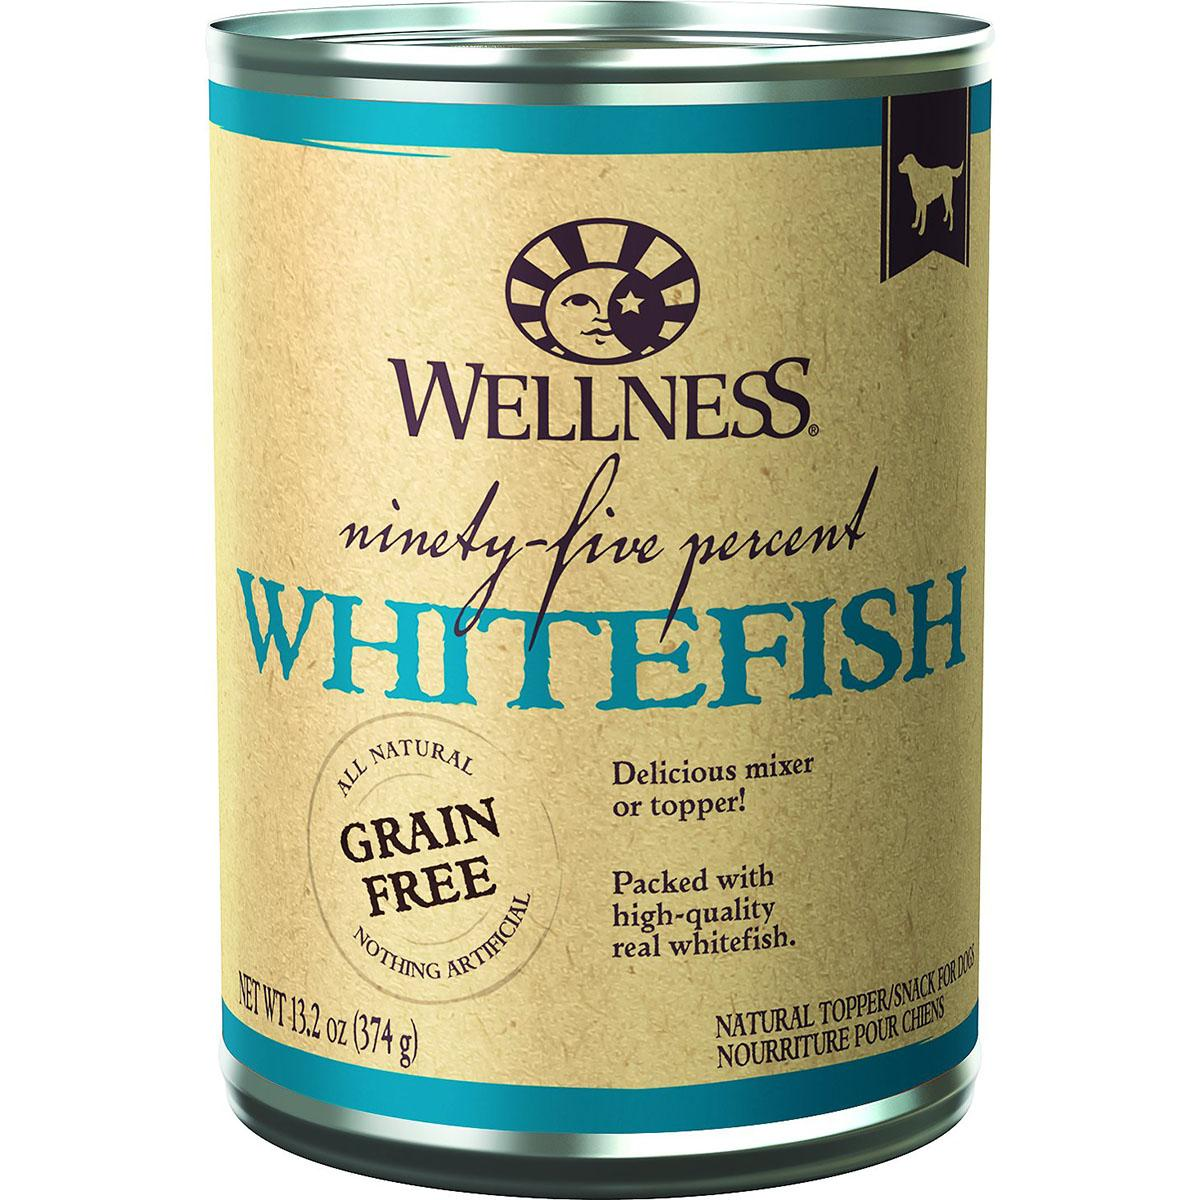 Wellness Ninety-Five Percent Whitefish Grain-Free Canned Dog Food